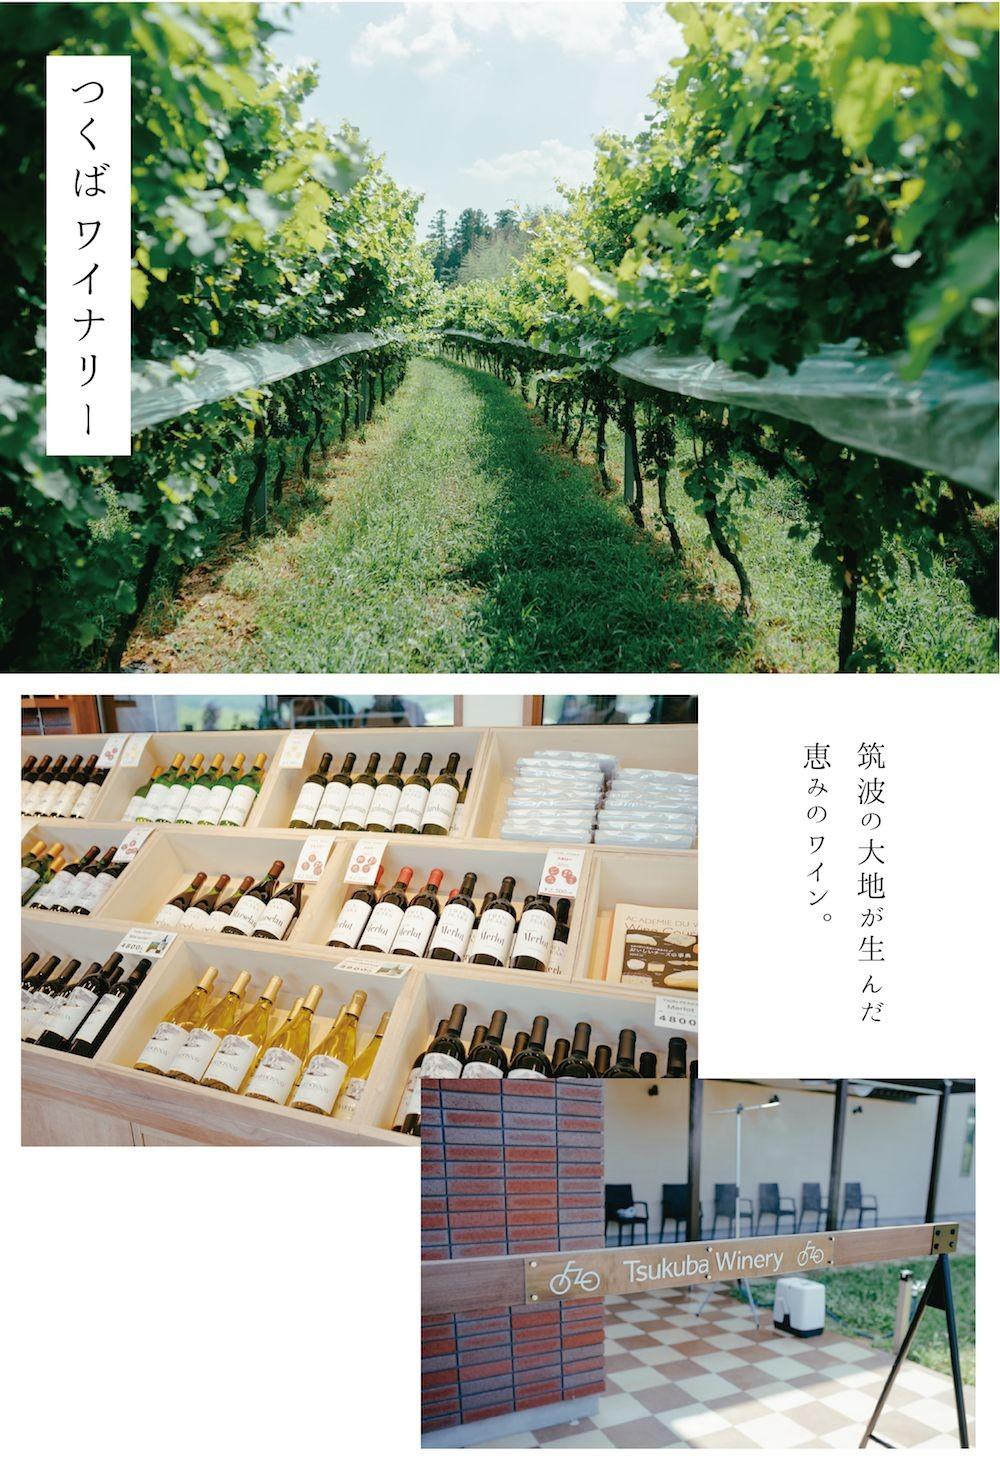 【SPOT】自転車旅で巡りたい、とびきりのごちそうや、よりみちスポット|「美しき、田舎景色を訪ねて。茨城自転車ものがたり。」の2枚目の画像